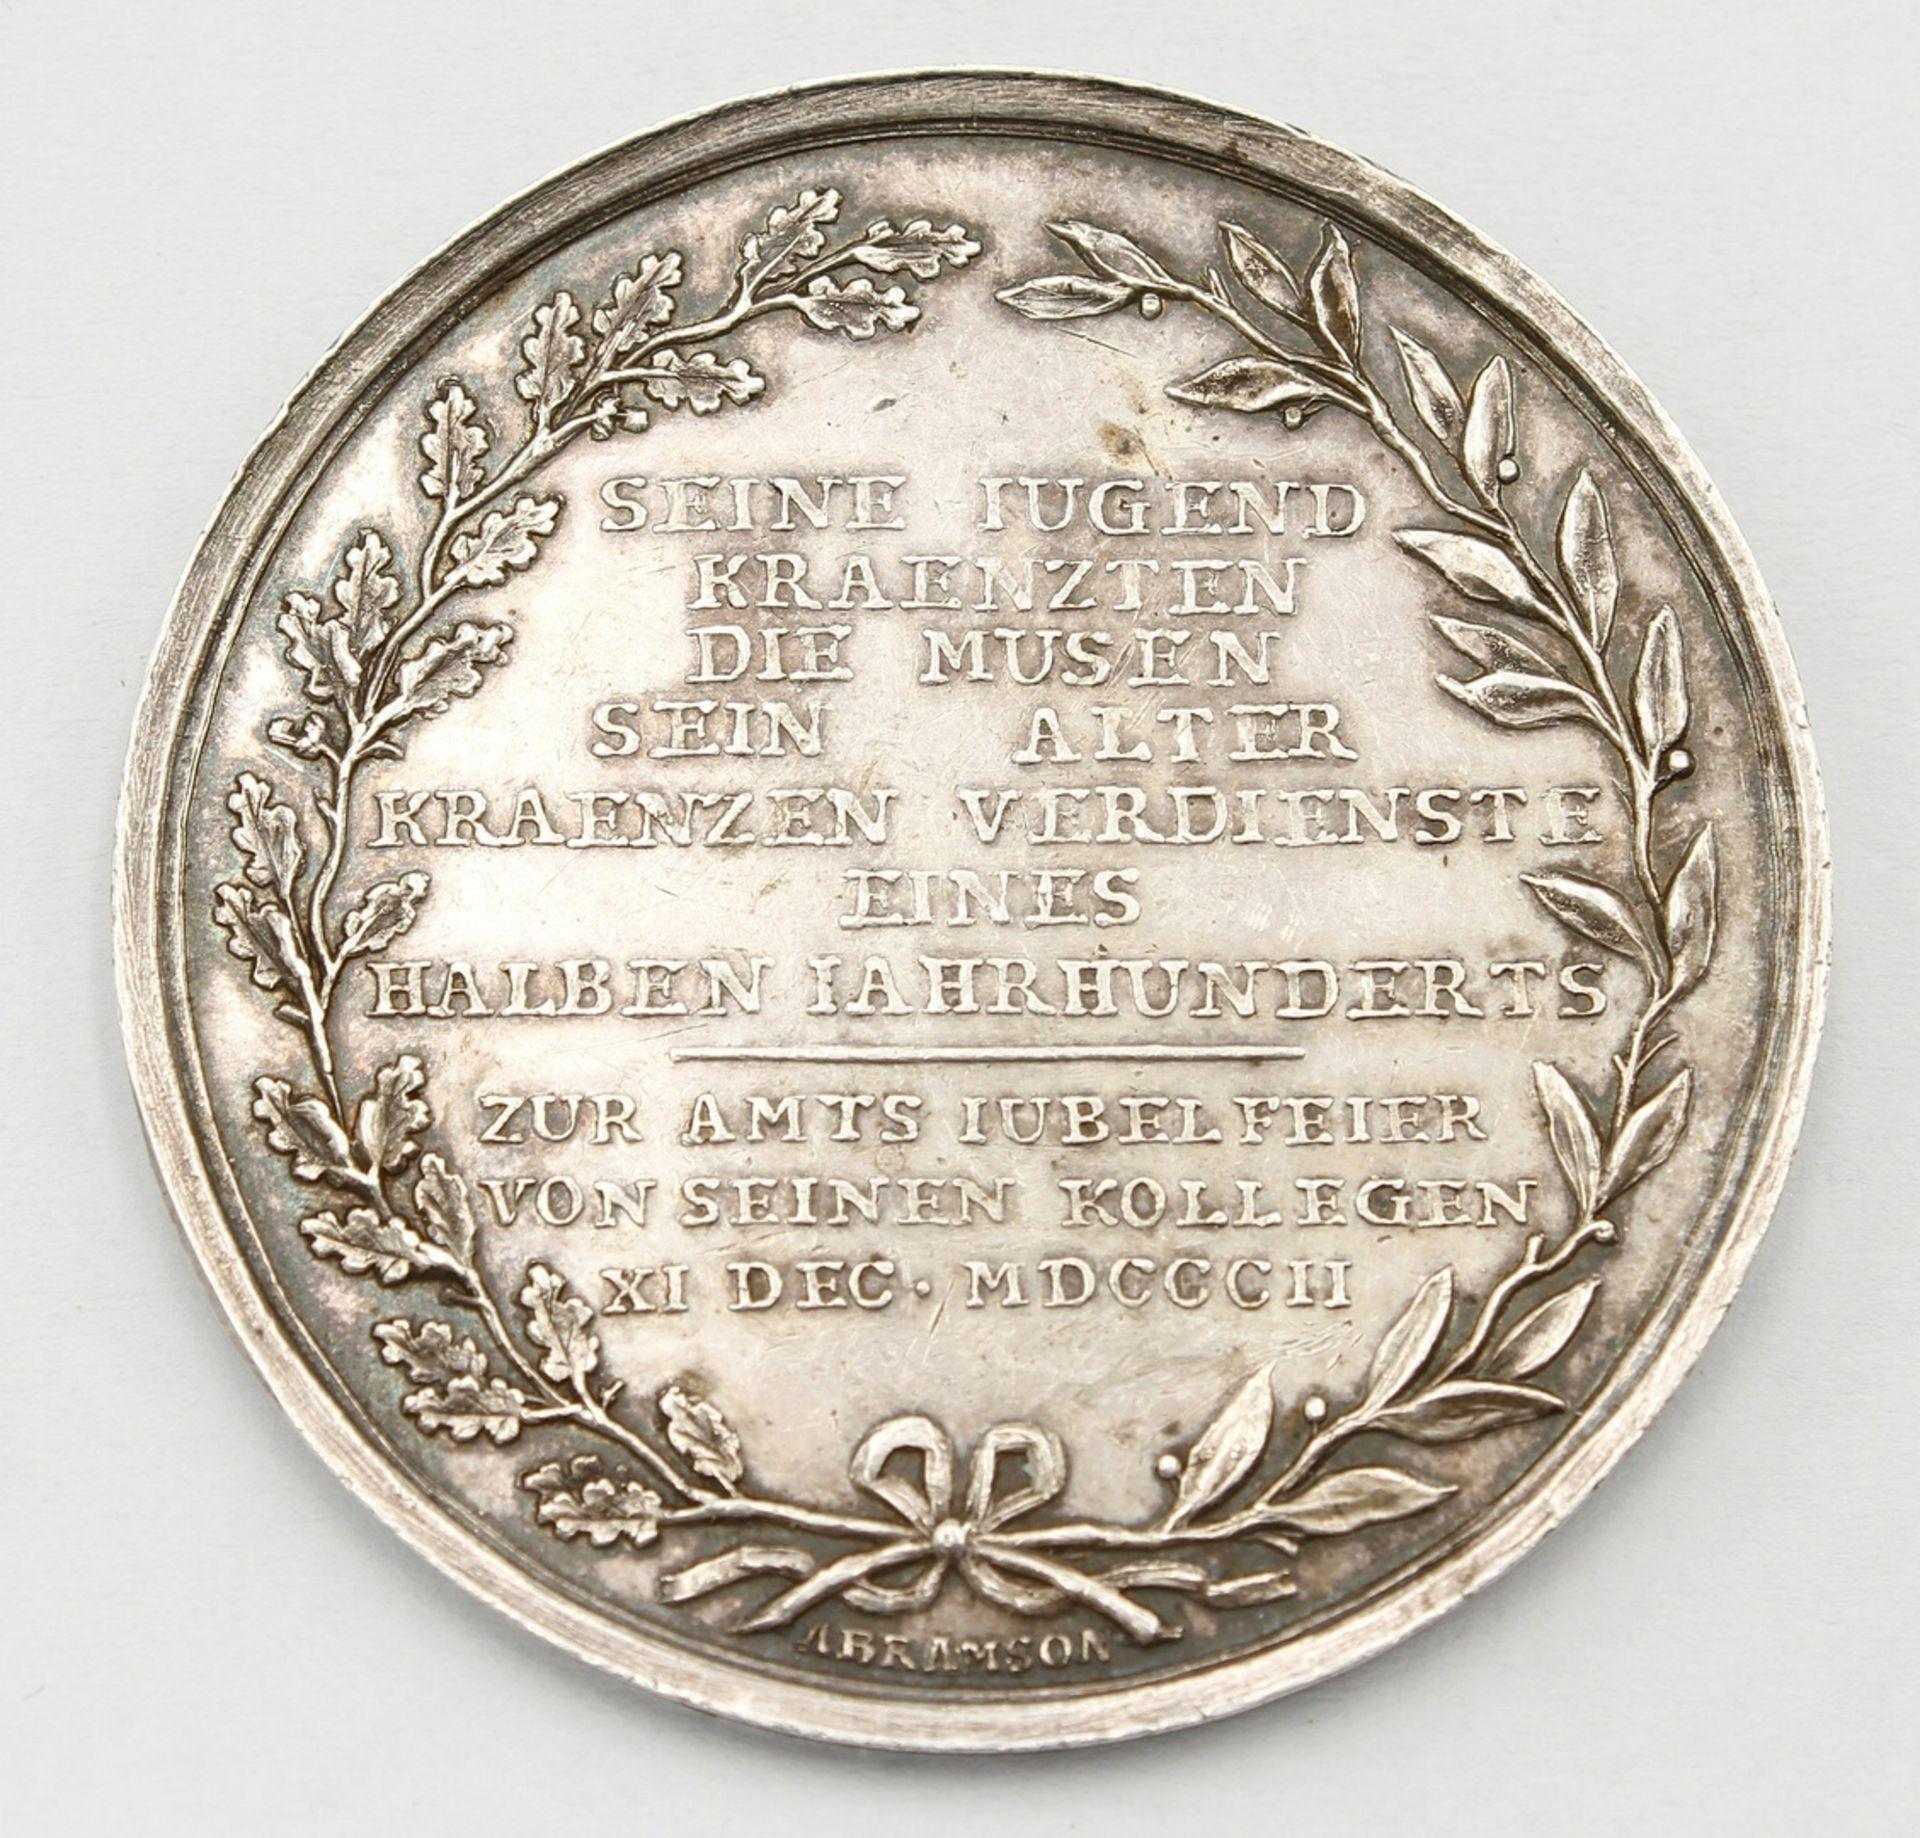 Jubiläumsmedaille Johann August v. Beyer, 1802 - Bild 2 aus 2